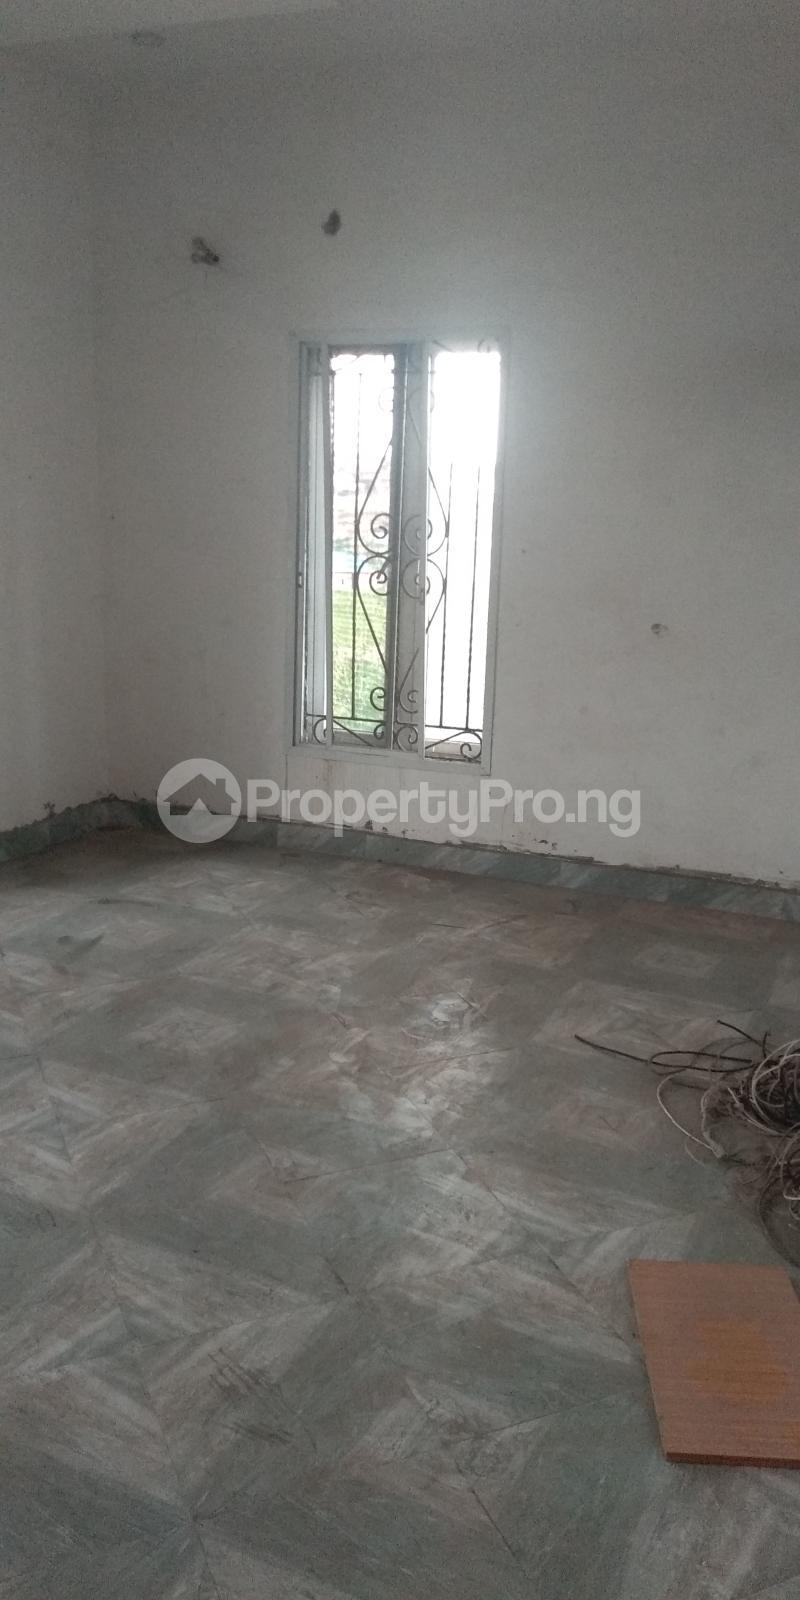 5 bedroom Land for sale Bashiru shittu street magodo shangisha Magodo GRA Phase 2 Kosofe/Ikosi Lagos - 8